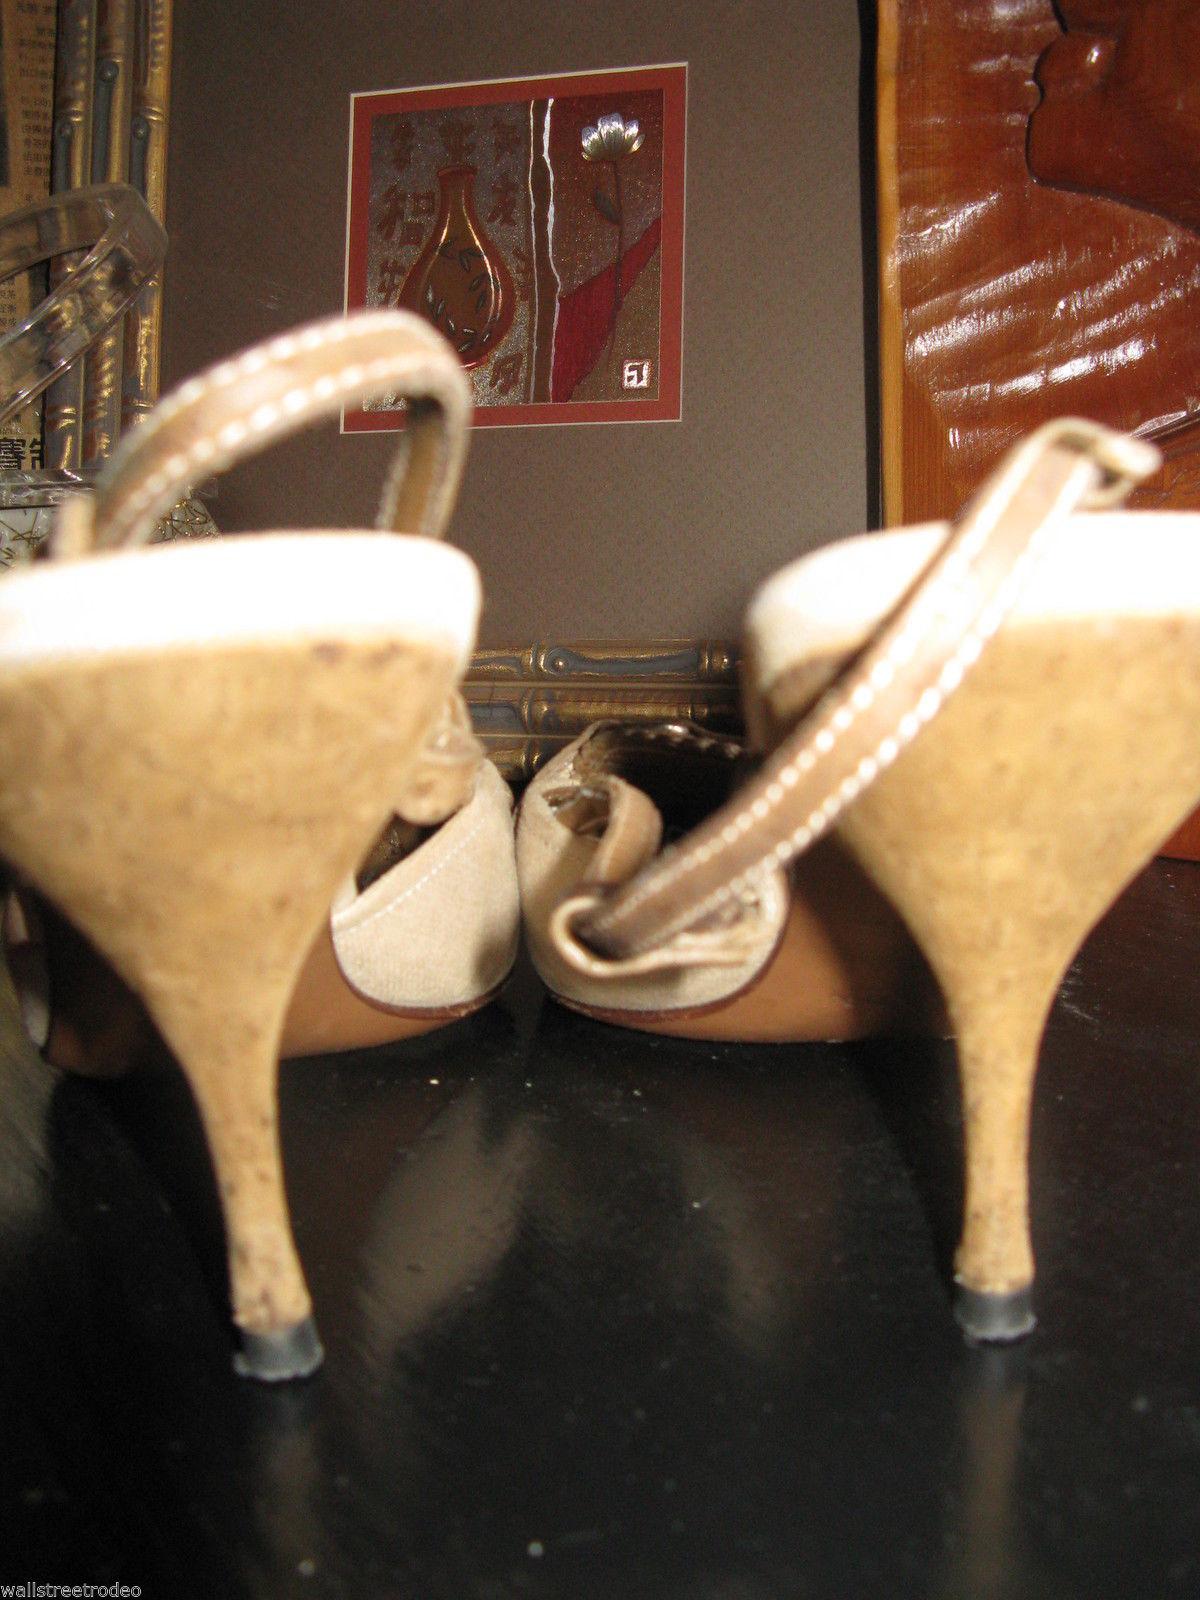 Prada Canapa St. Pecar sling back stiletto pumps heels shoes 8 38 UK5.5